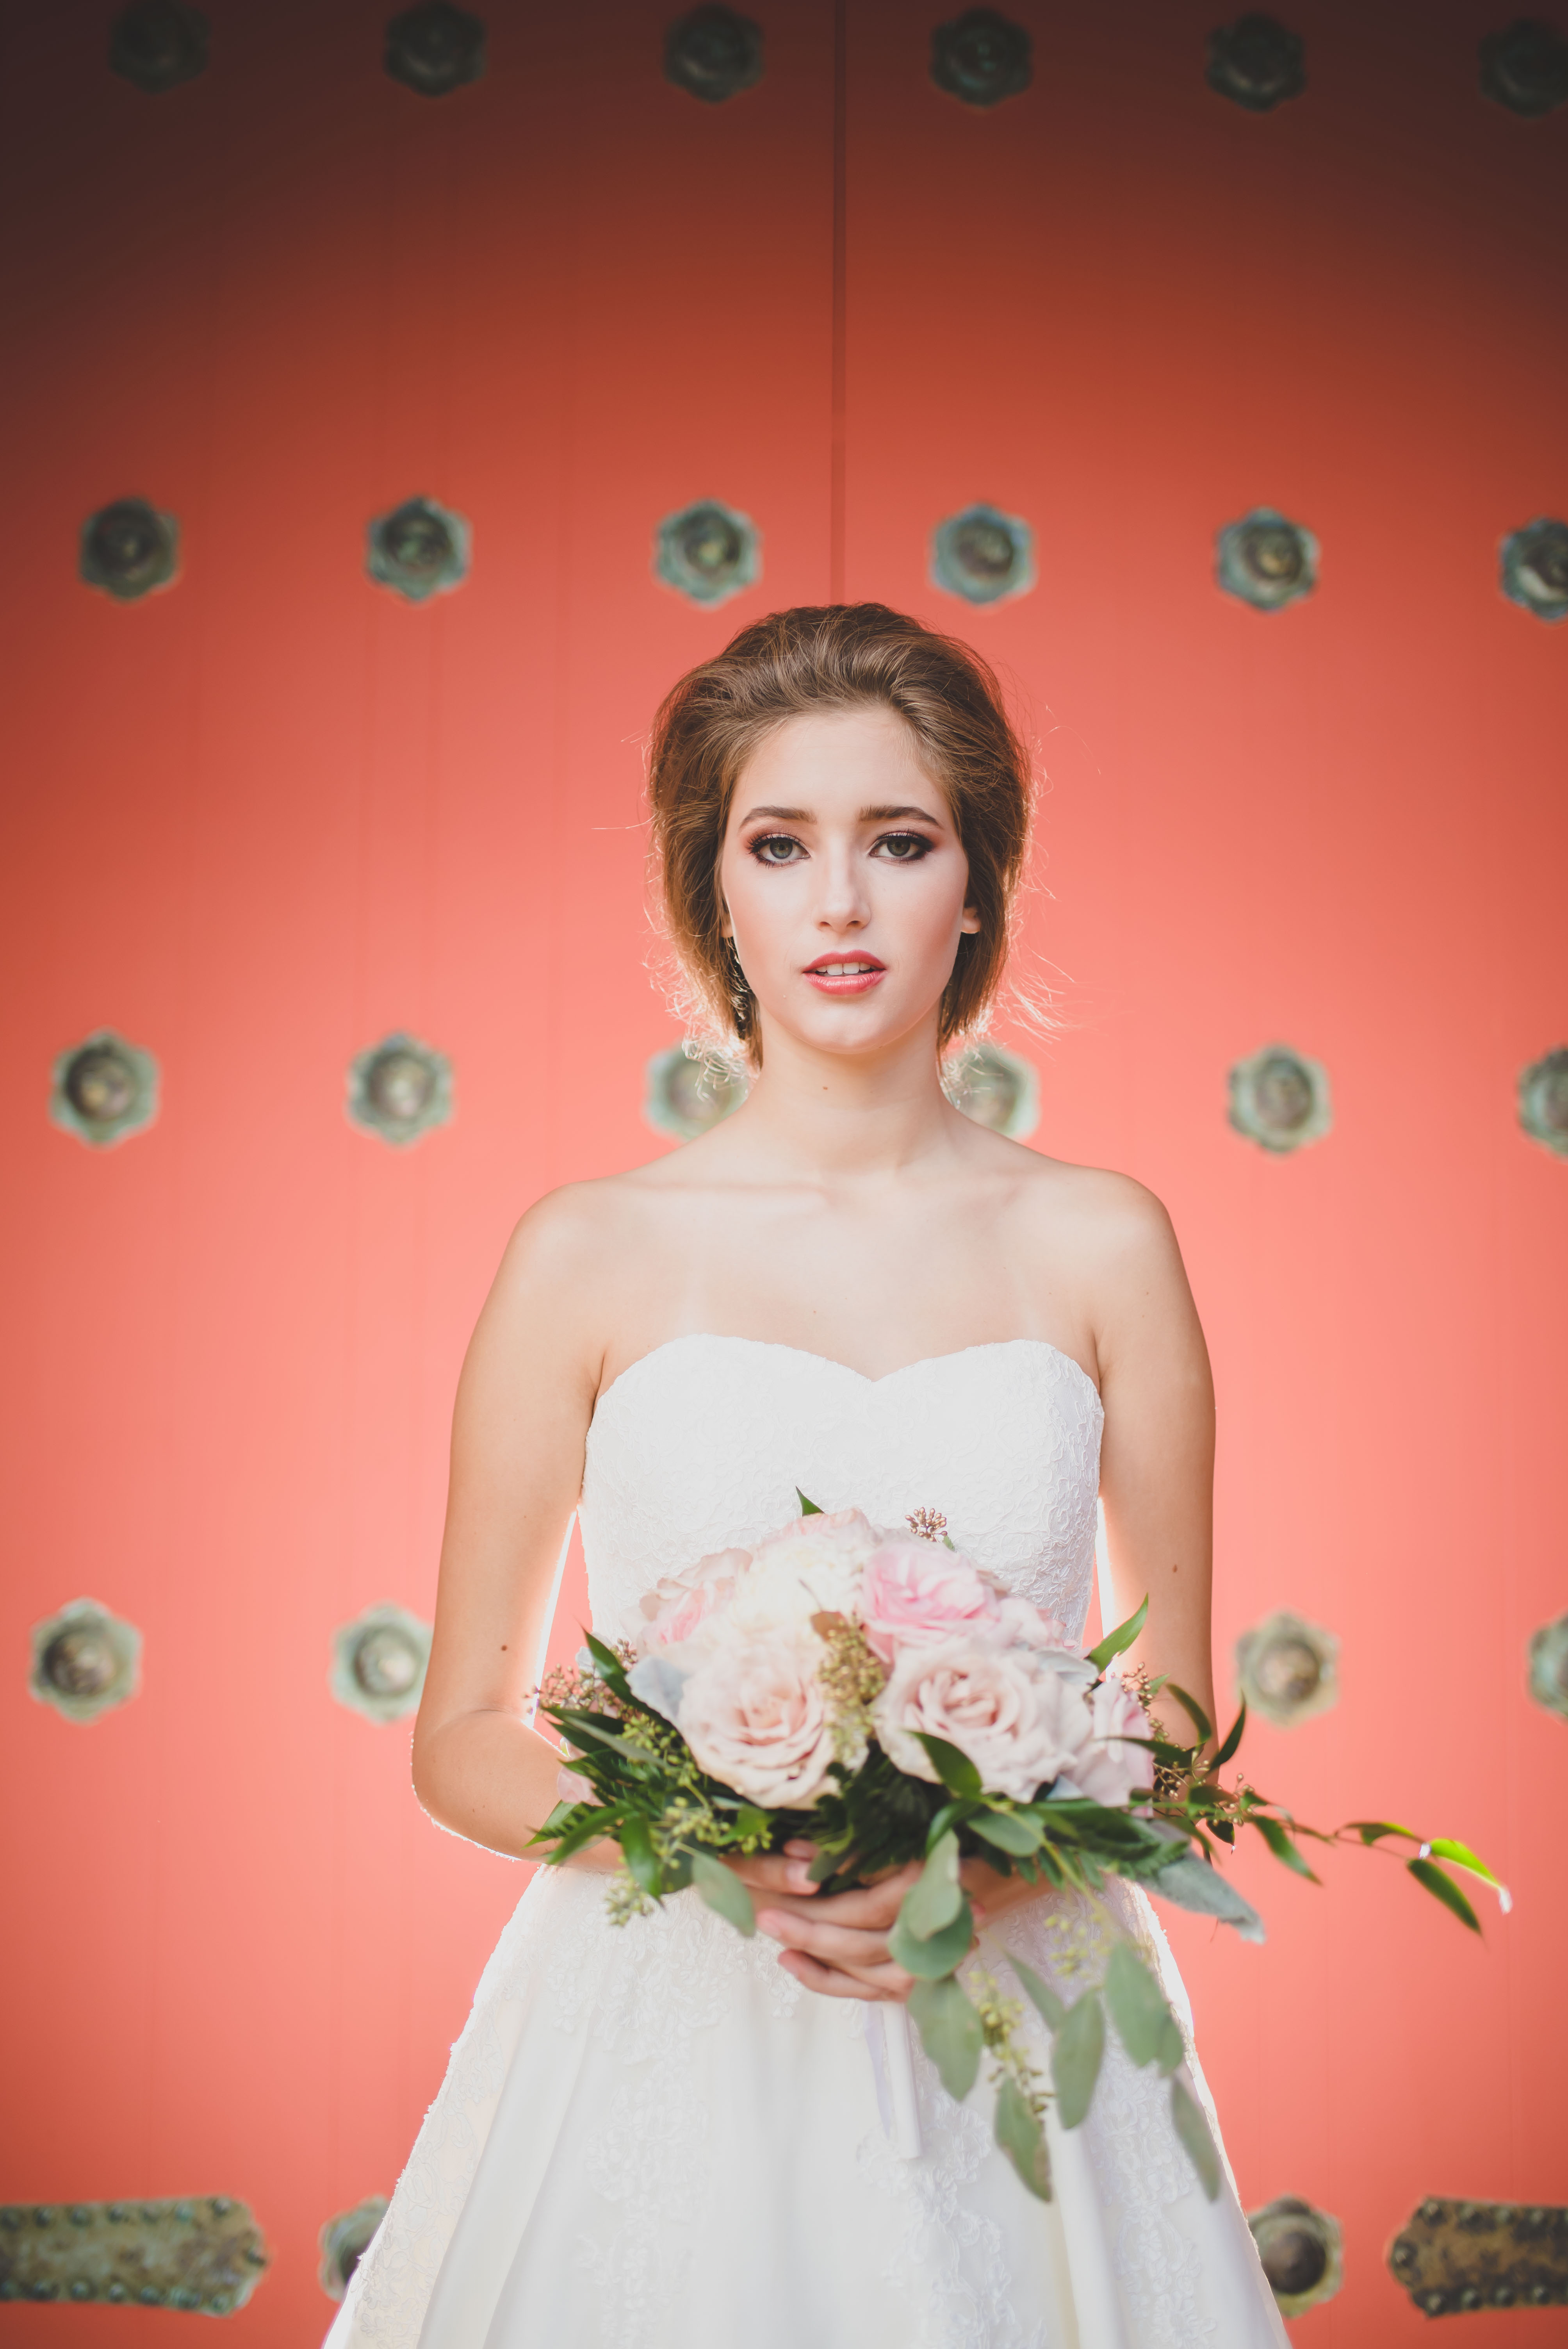 Timeless Bridal beauty